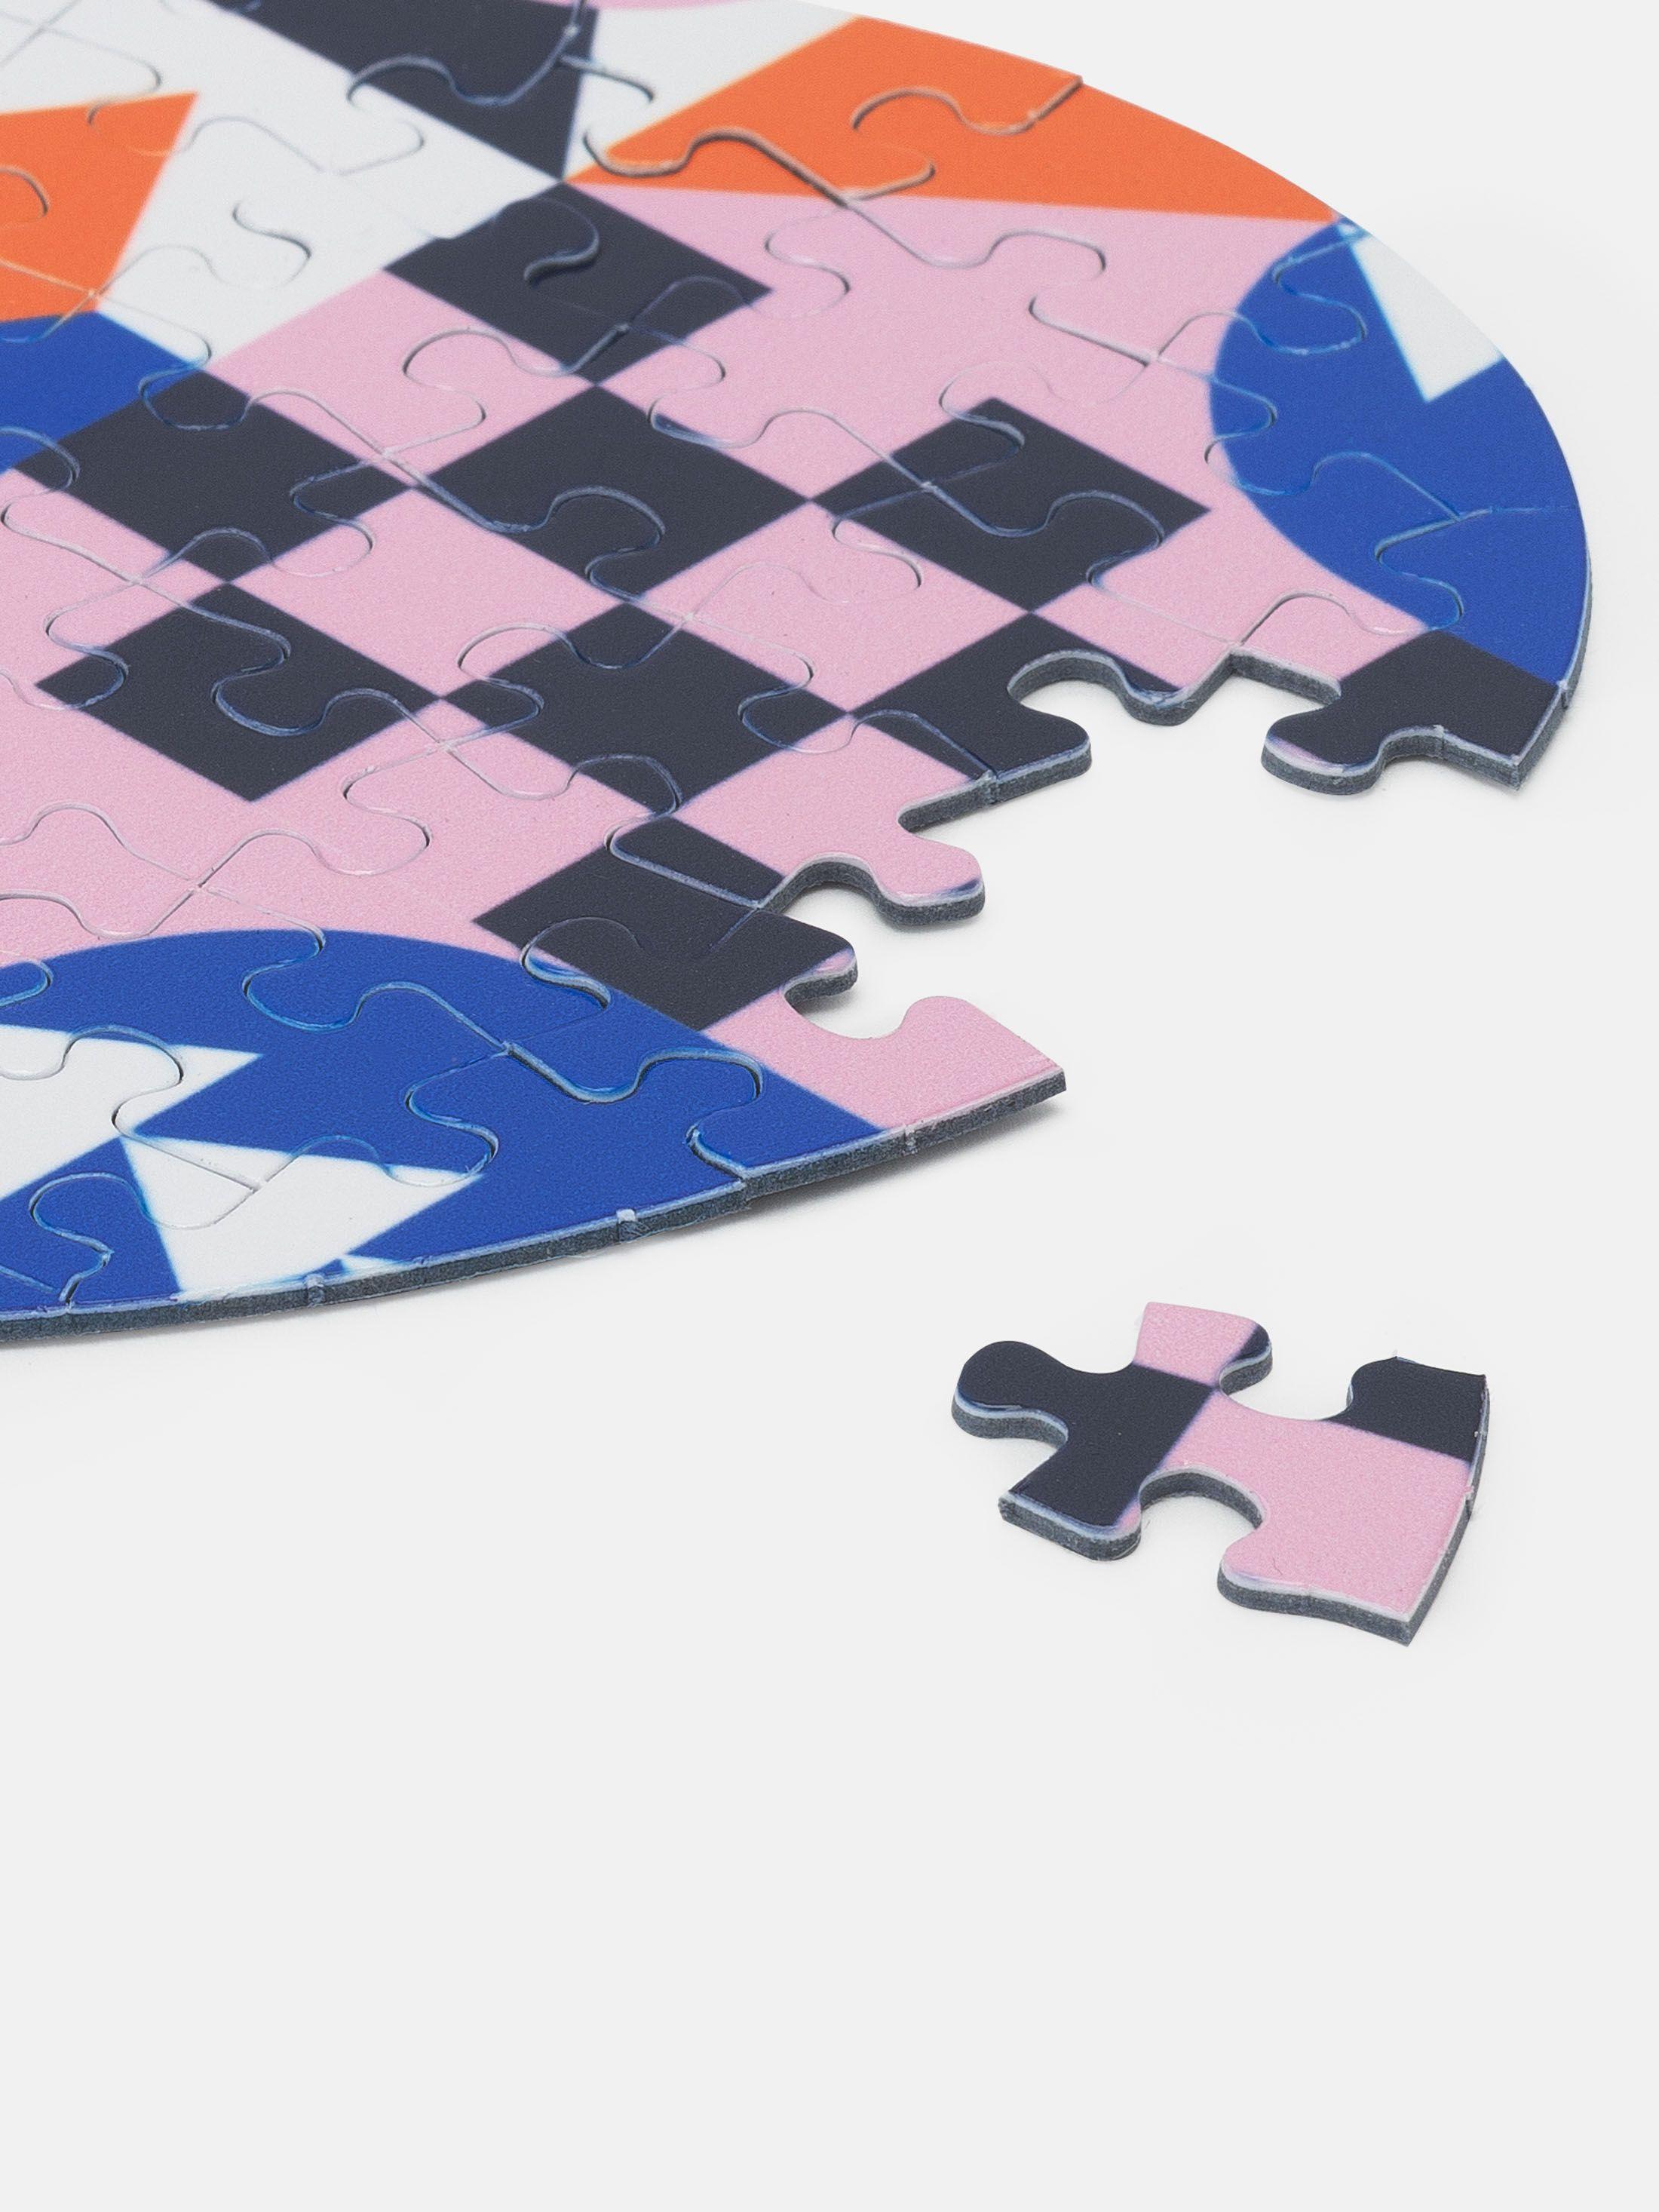 Card jigsaw puzzle design